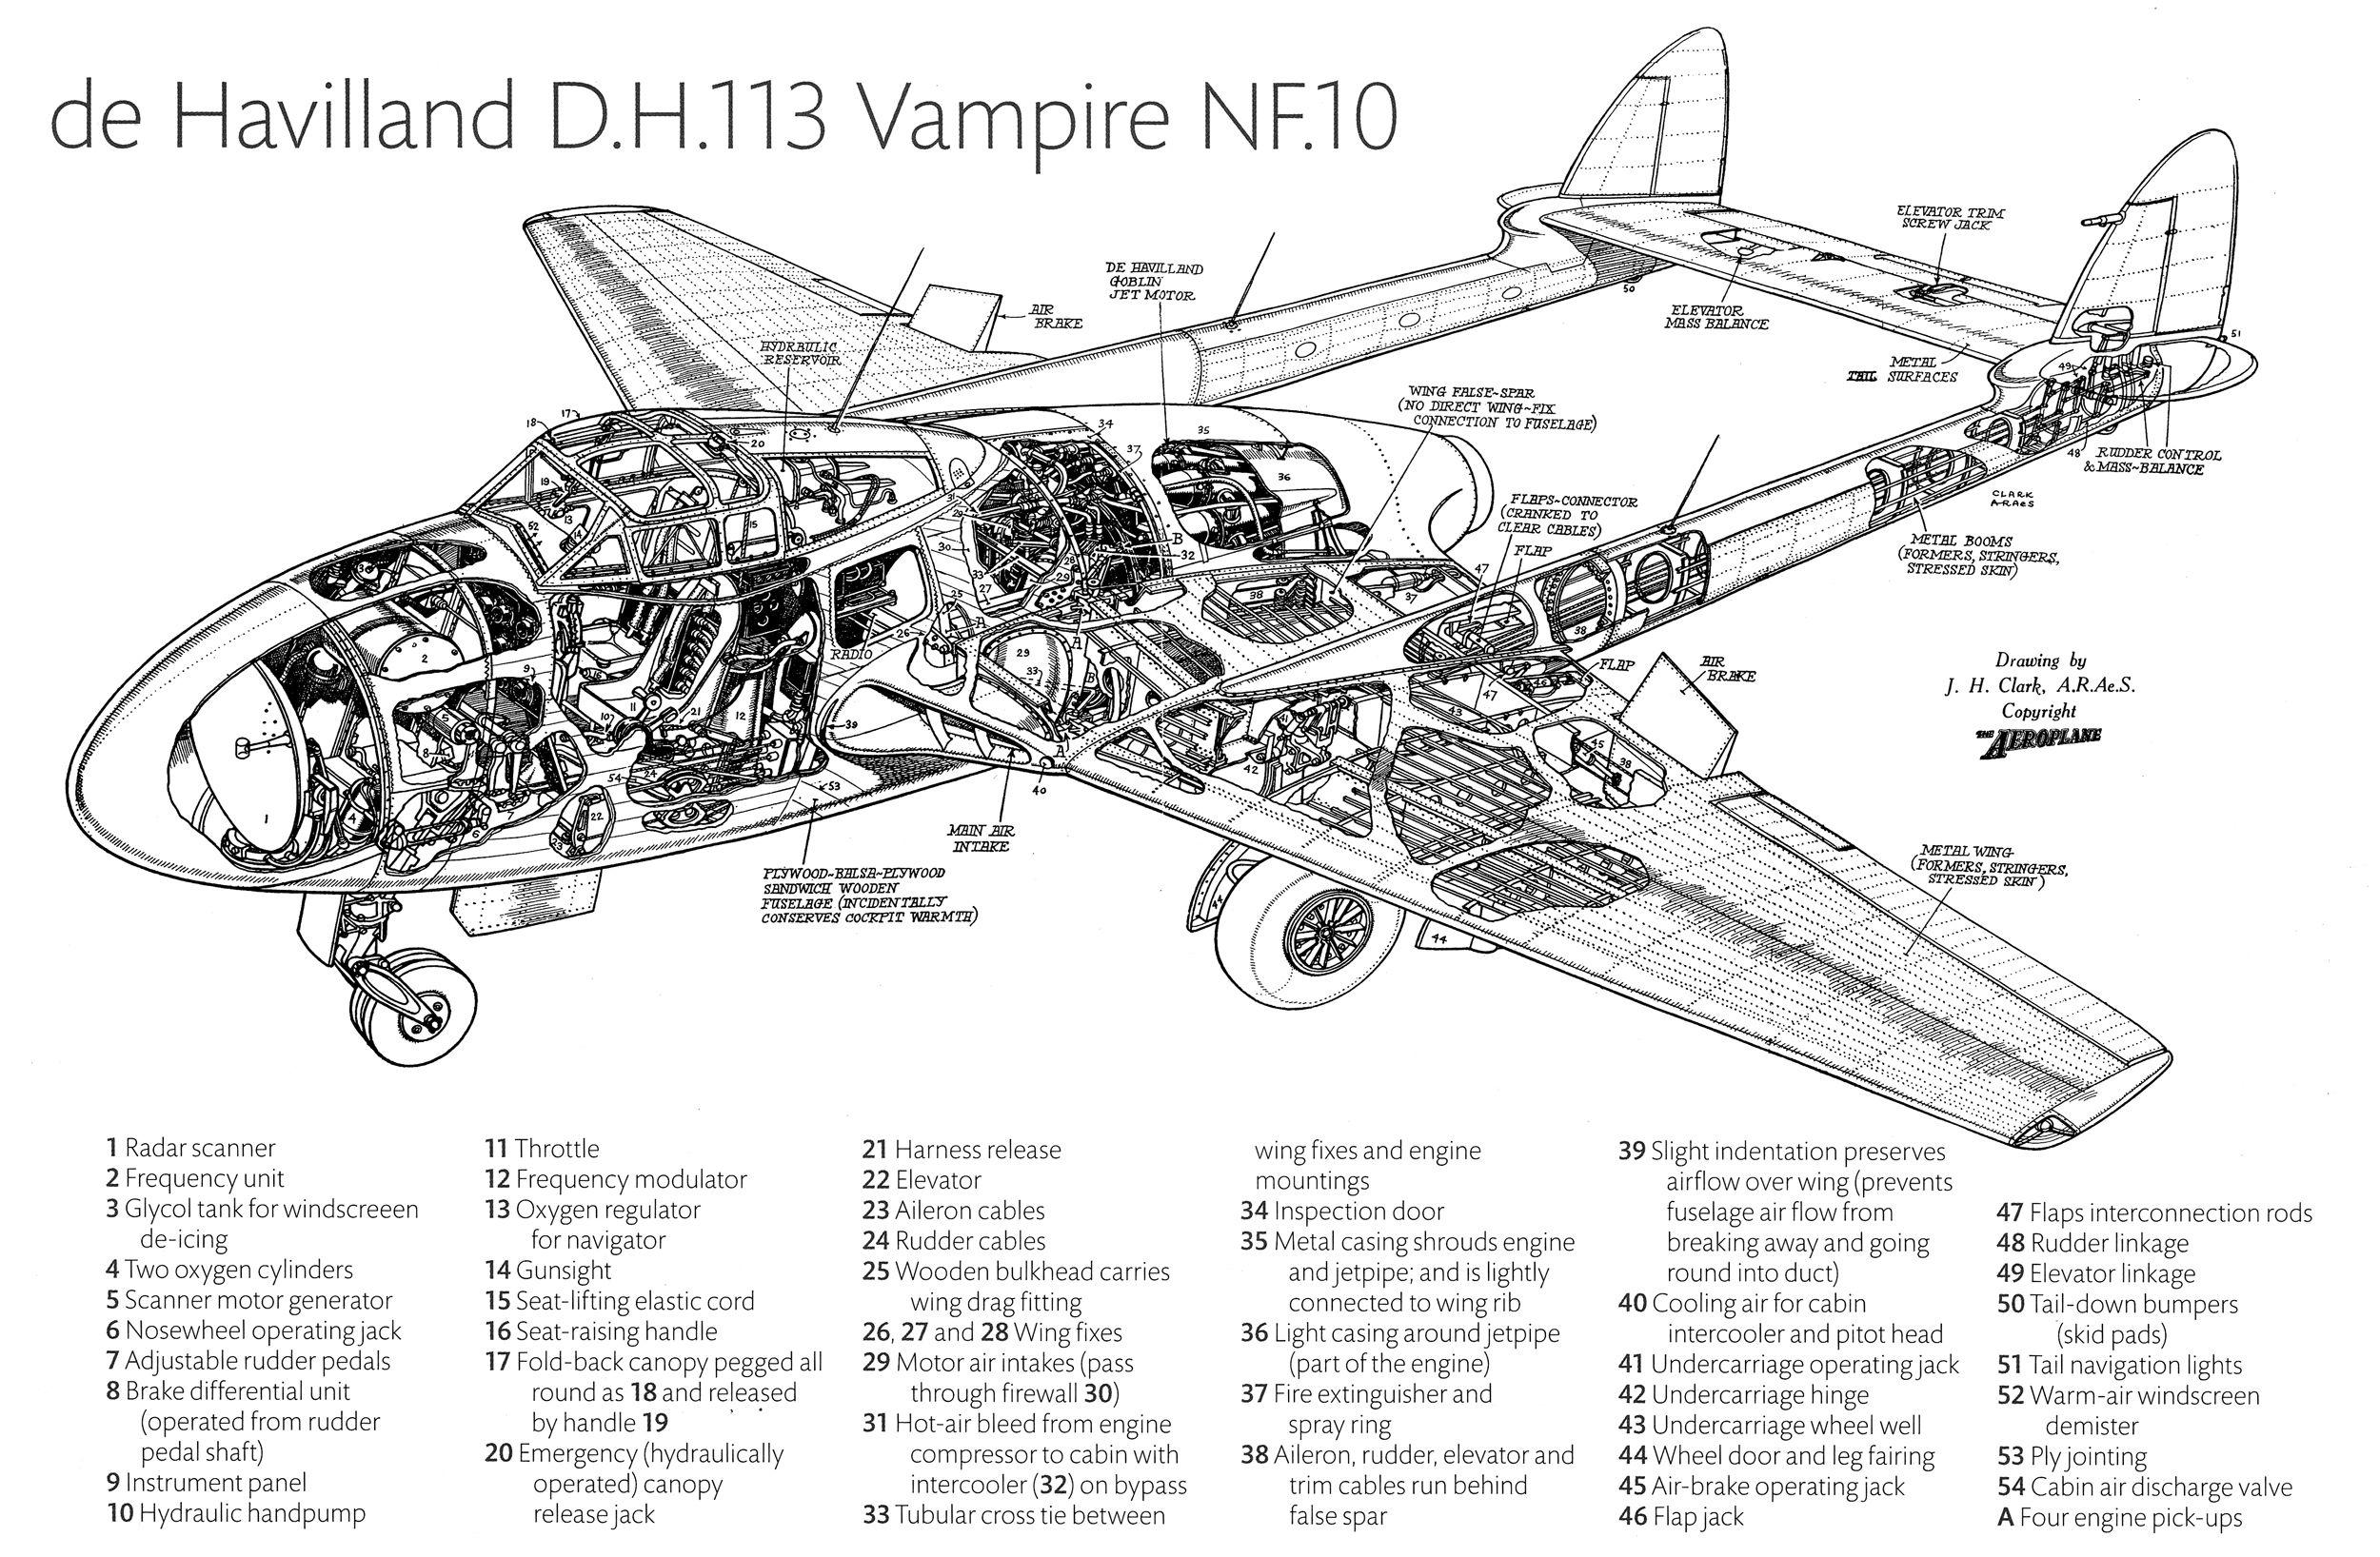 De Havilland D H 113 Vampire Nf 10 Cutaway